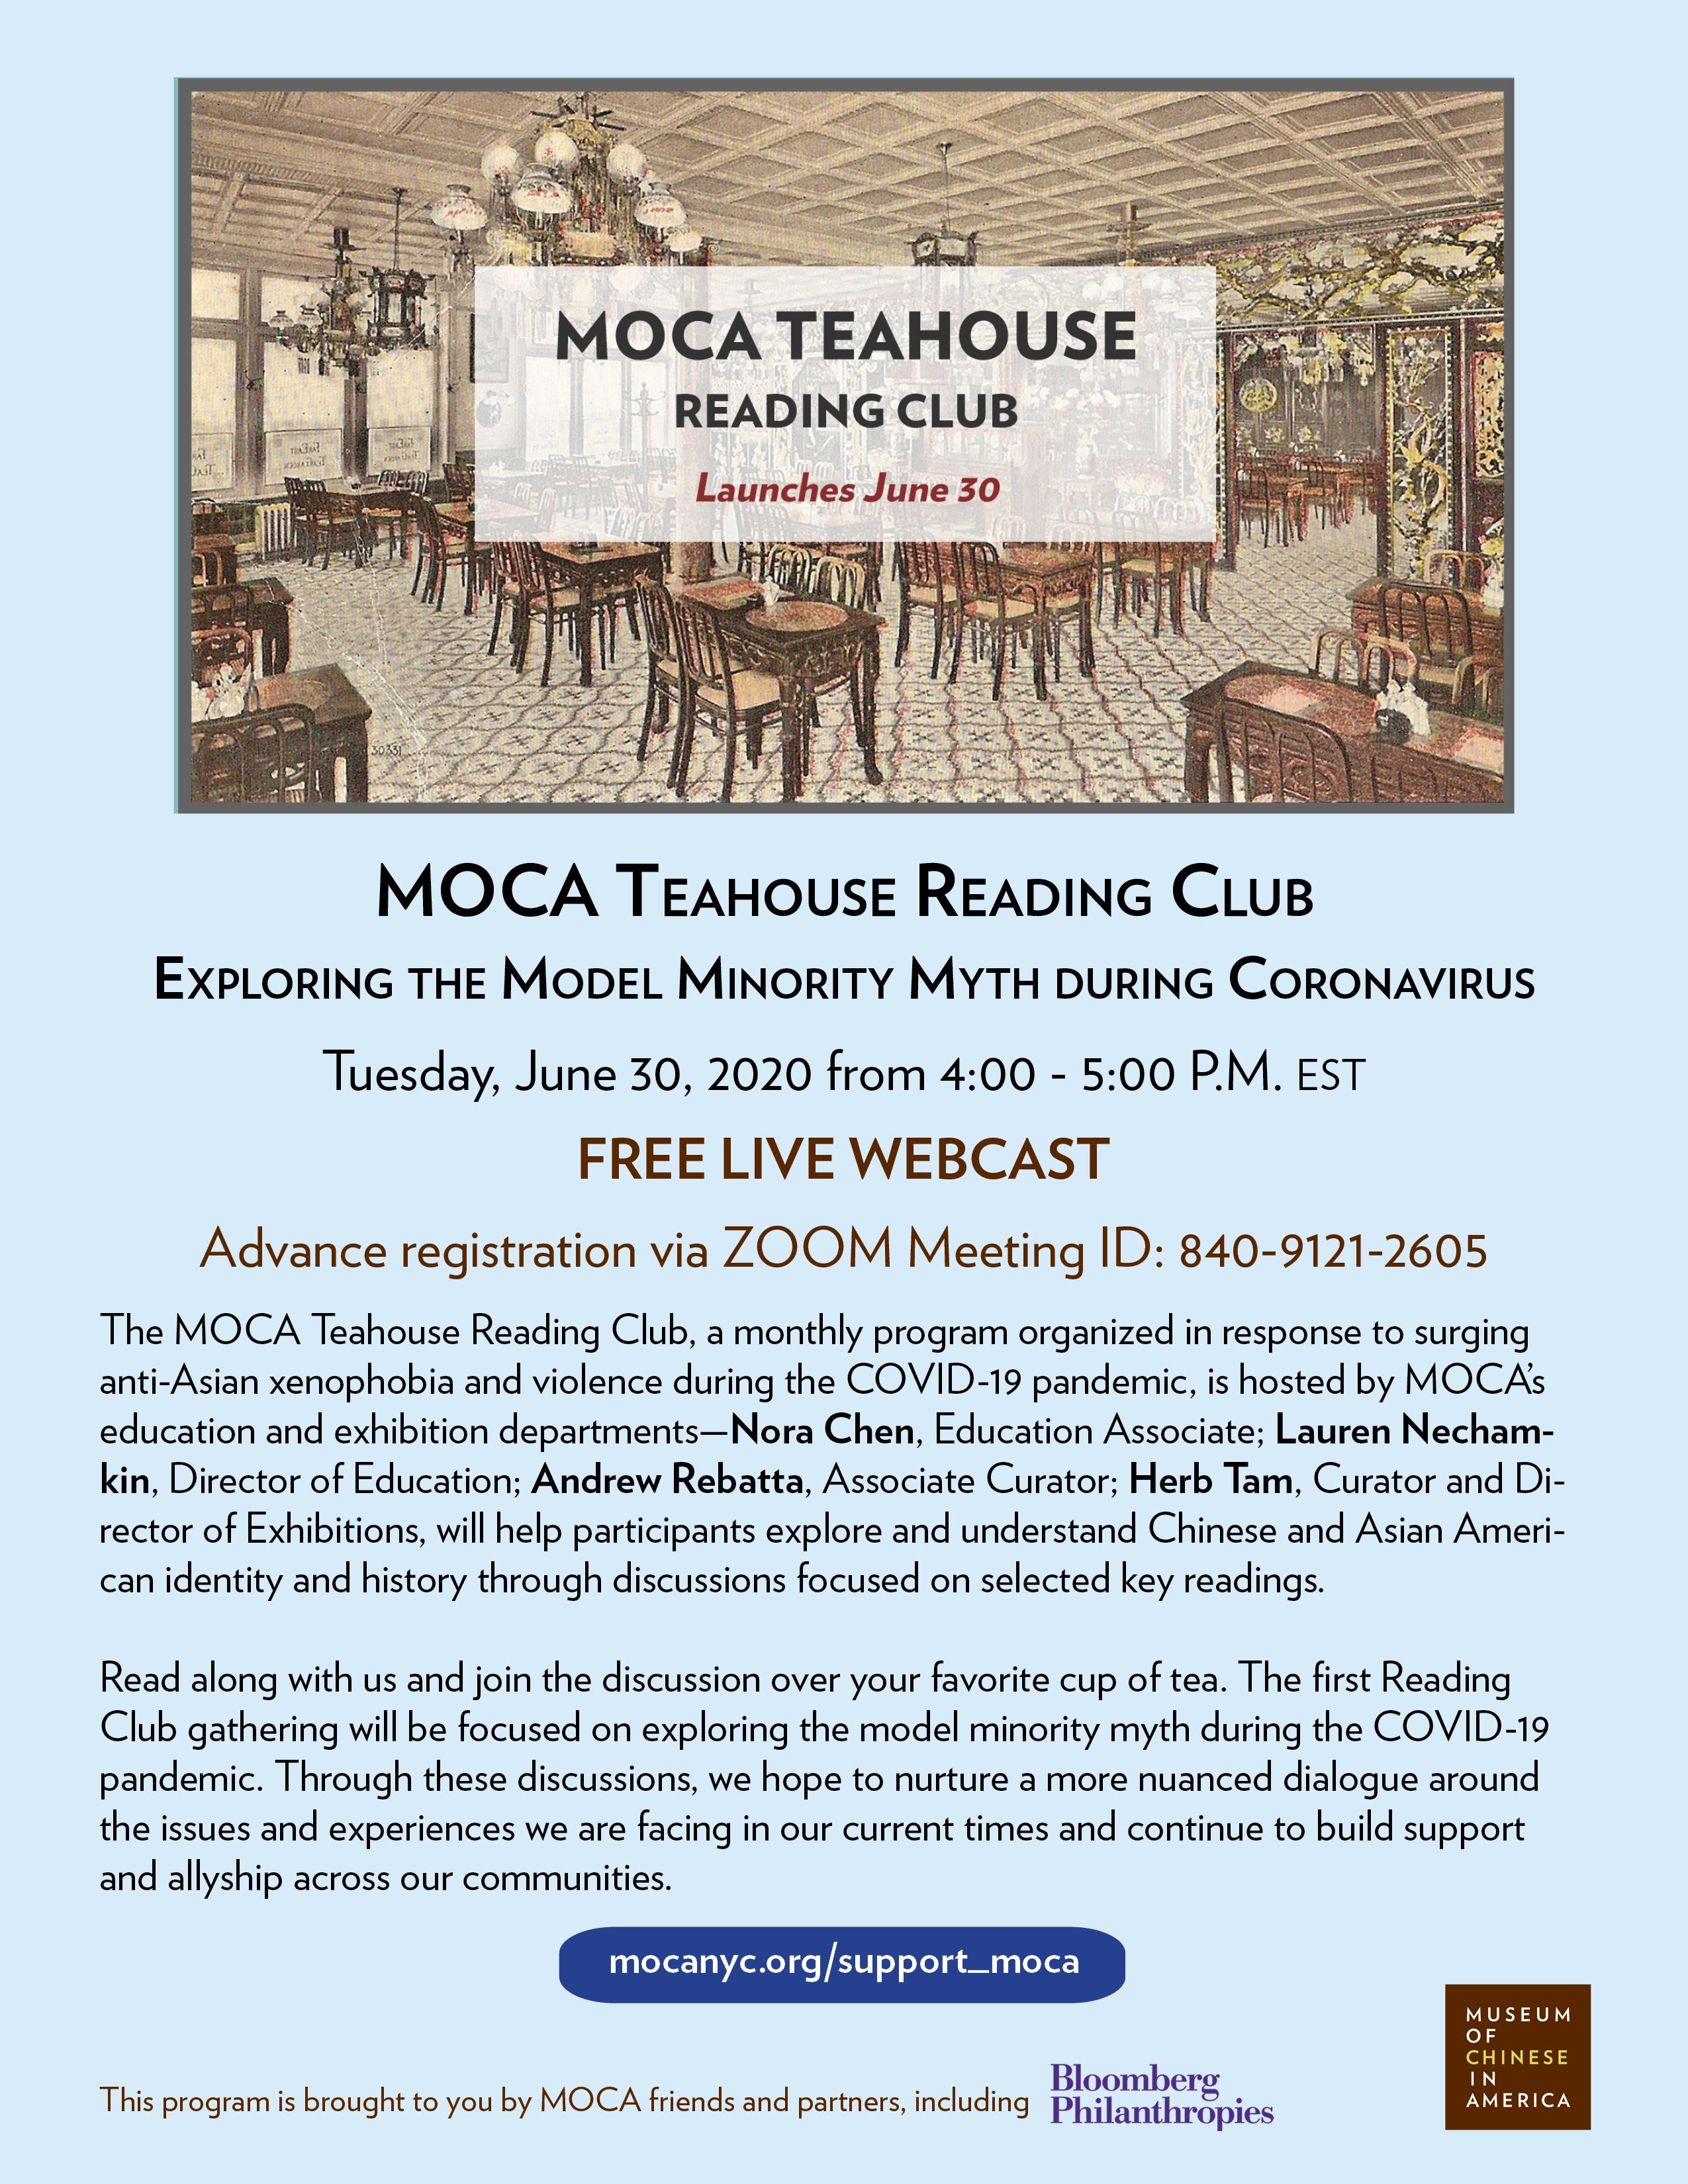 MOCA Teahouse Reading Club: Exploring the Model Minority Myth during Coronavirus